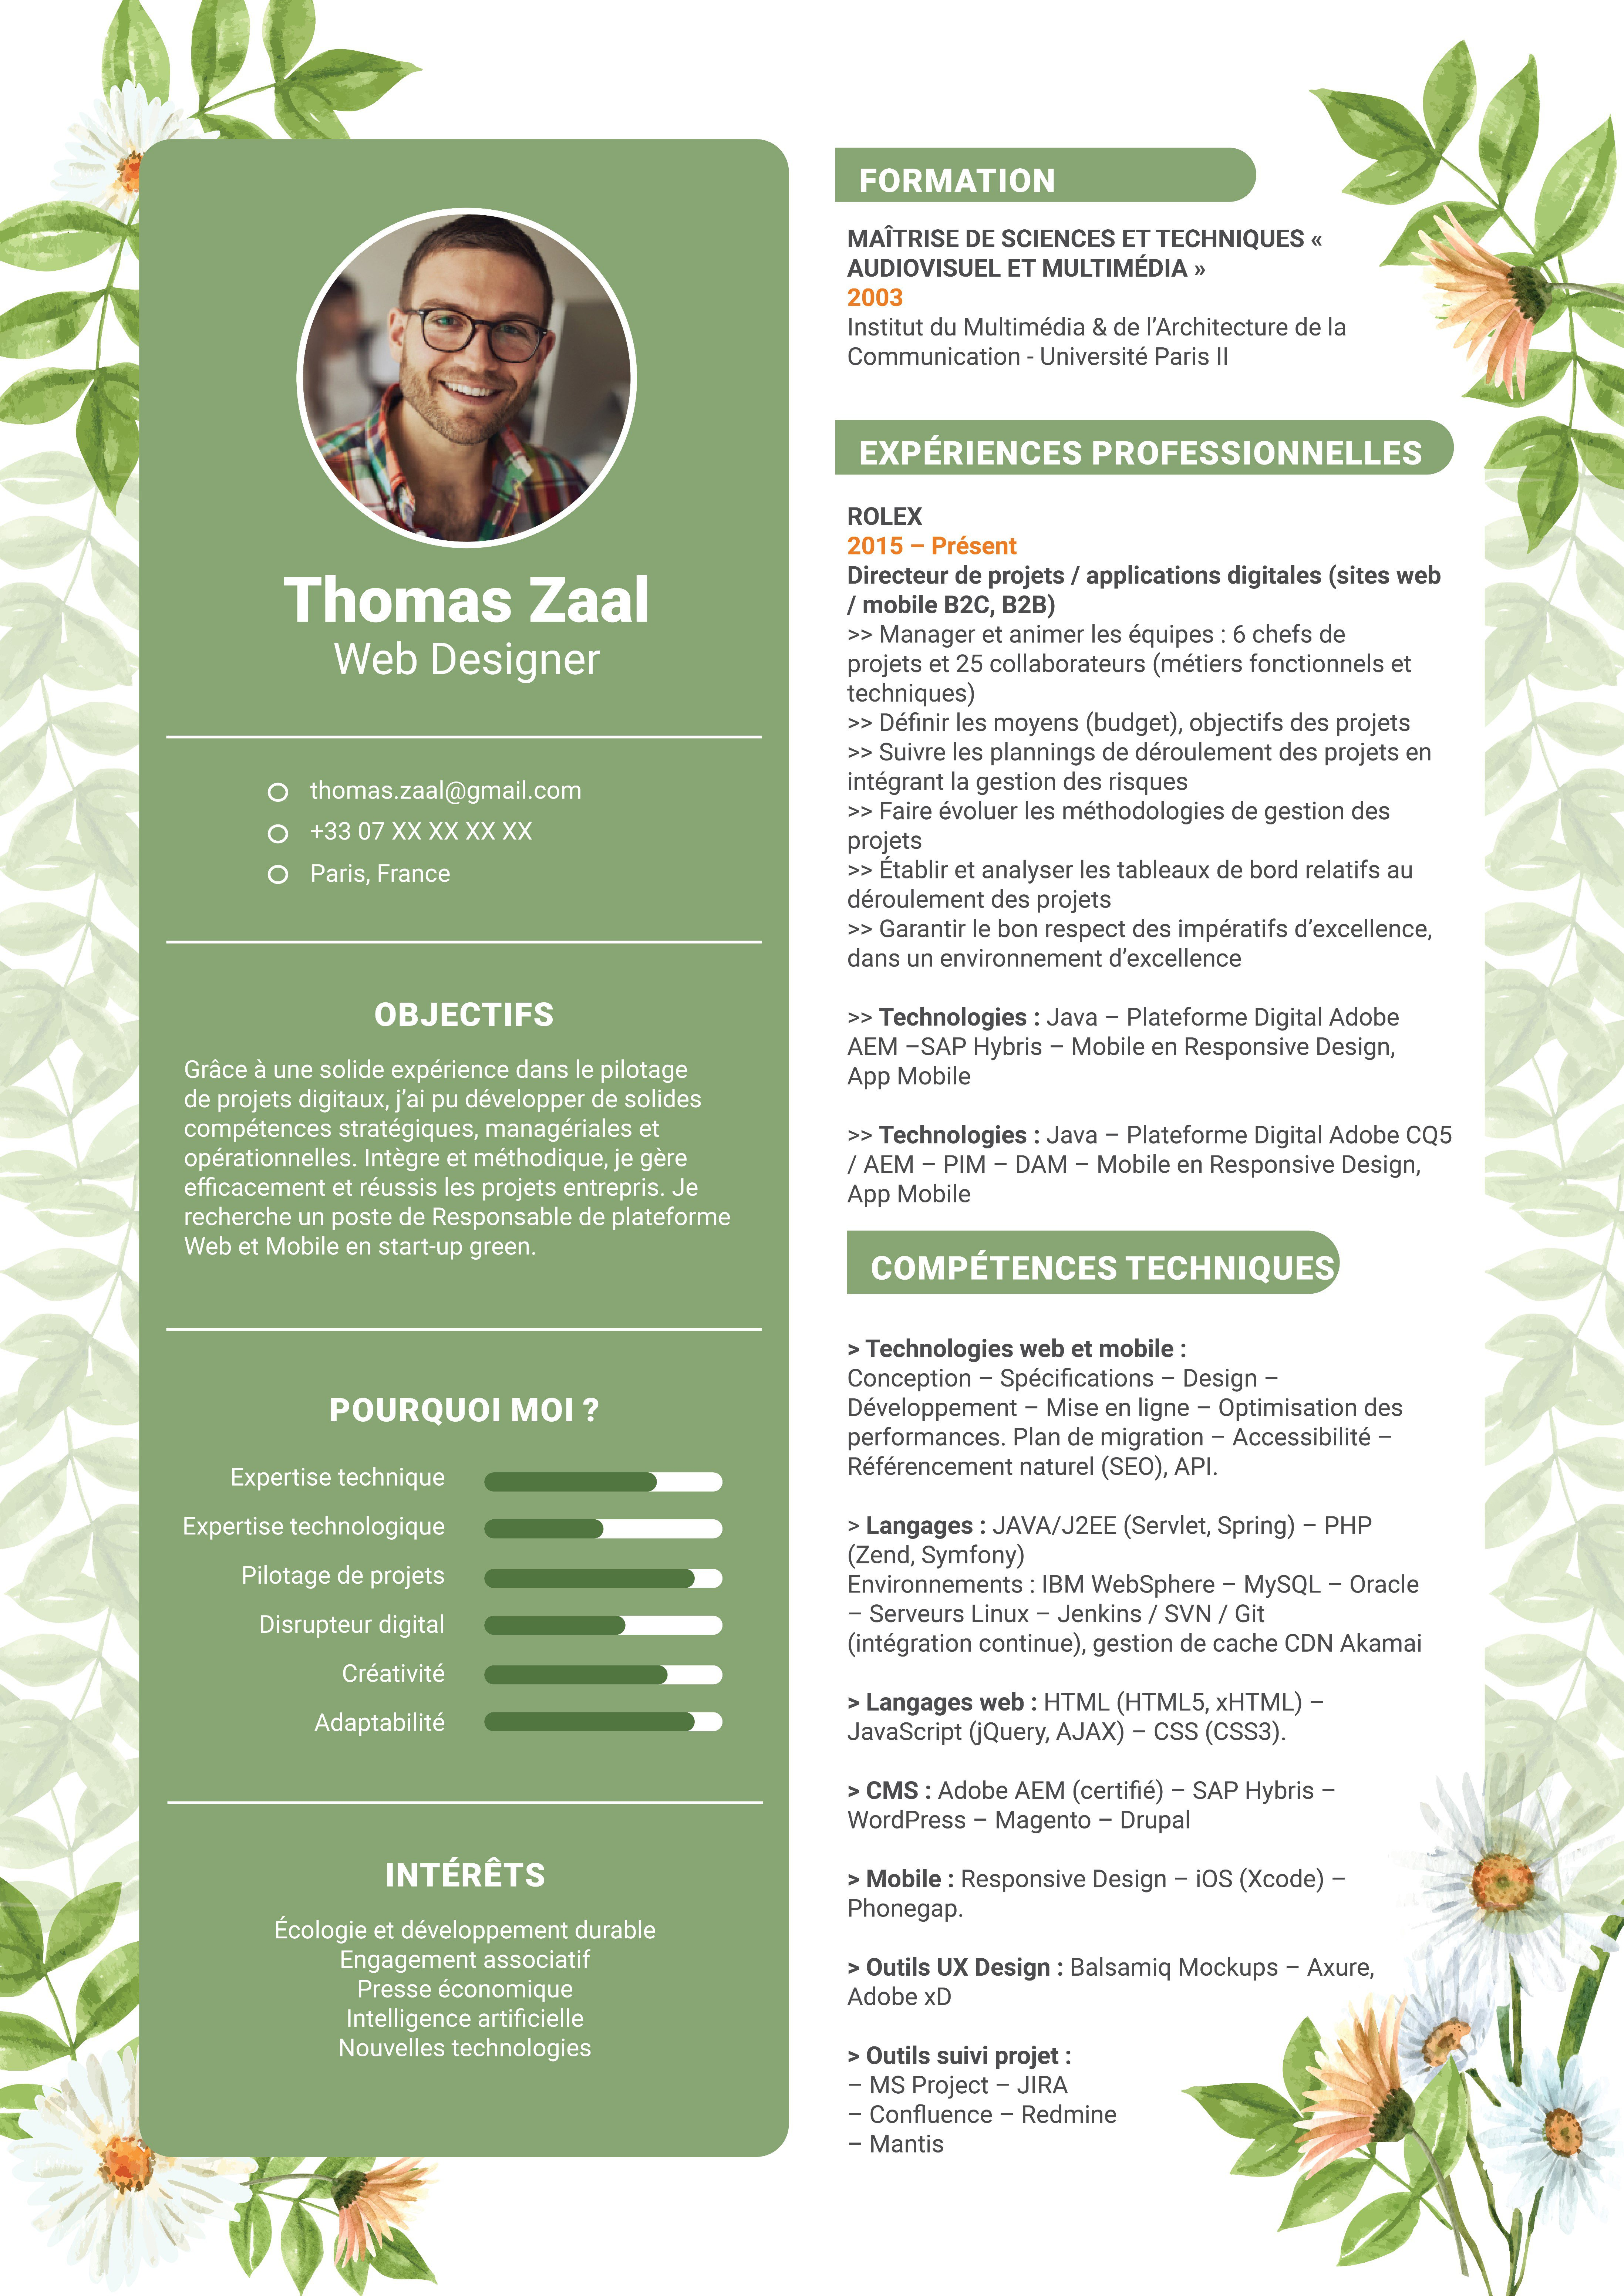 Resume 5_webdesigner with green style.jpg